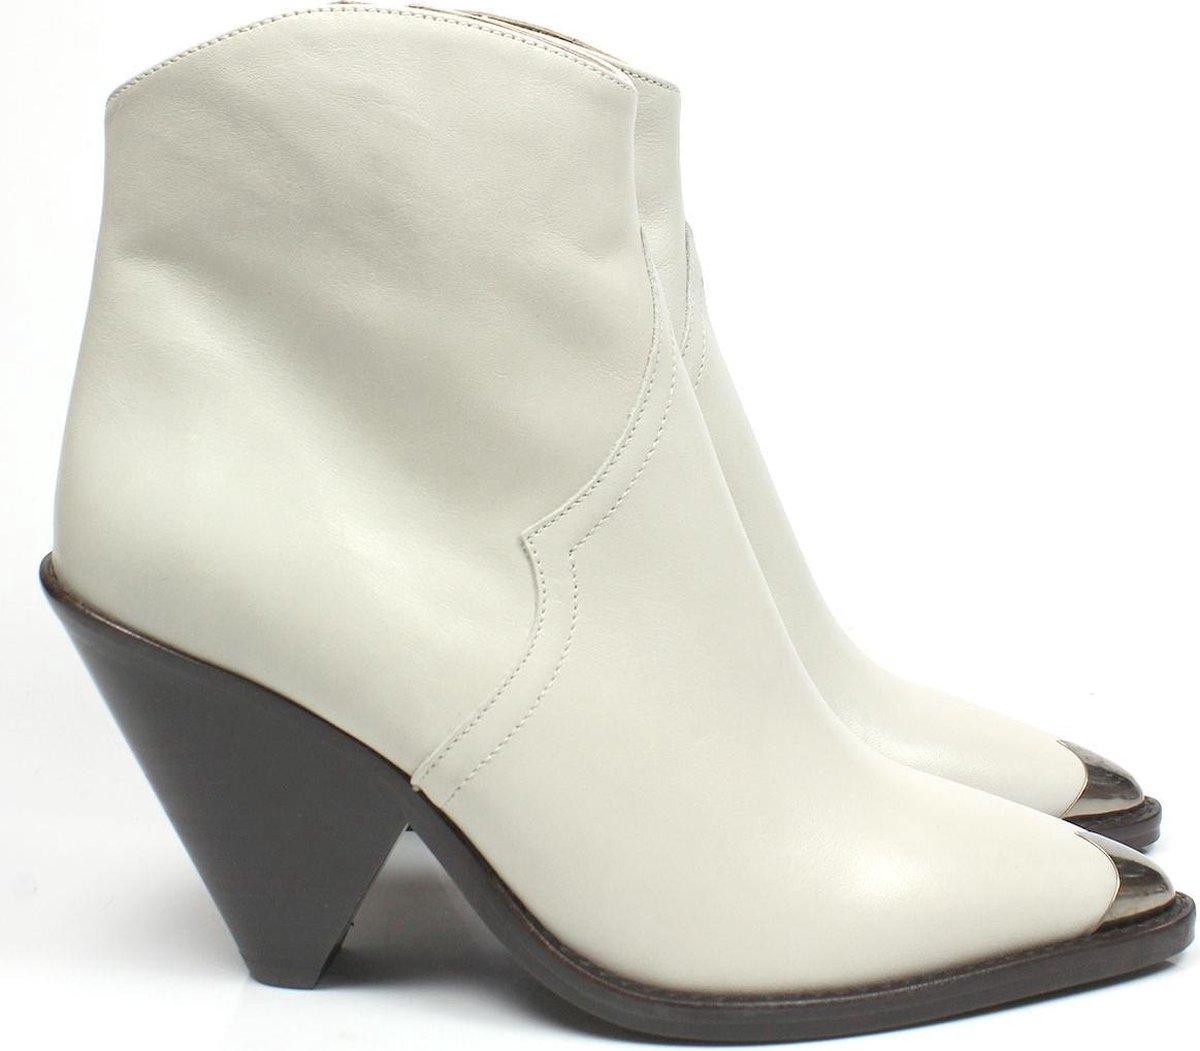 | Toral 12369 dames boots gebroken wit offwhite